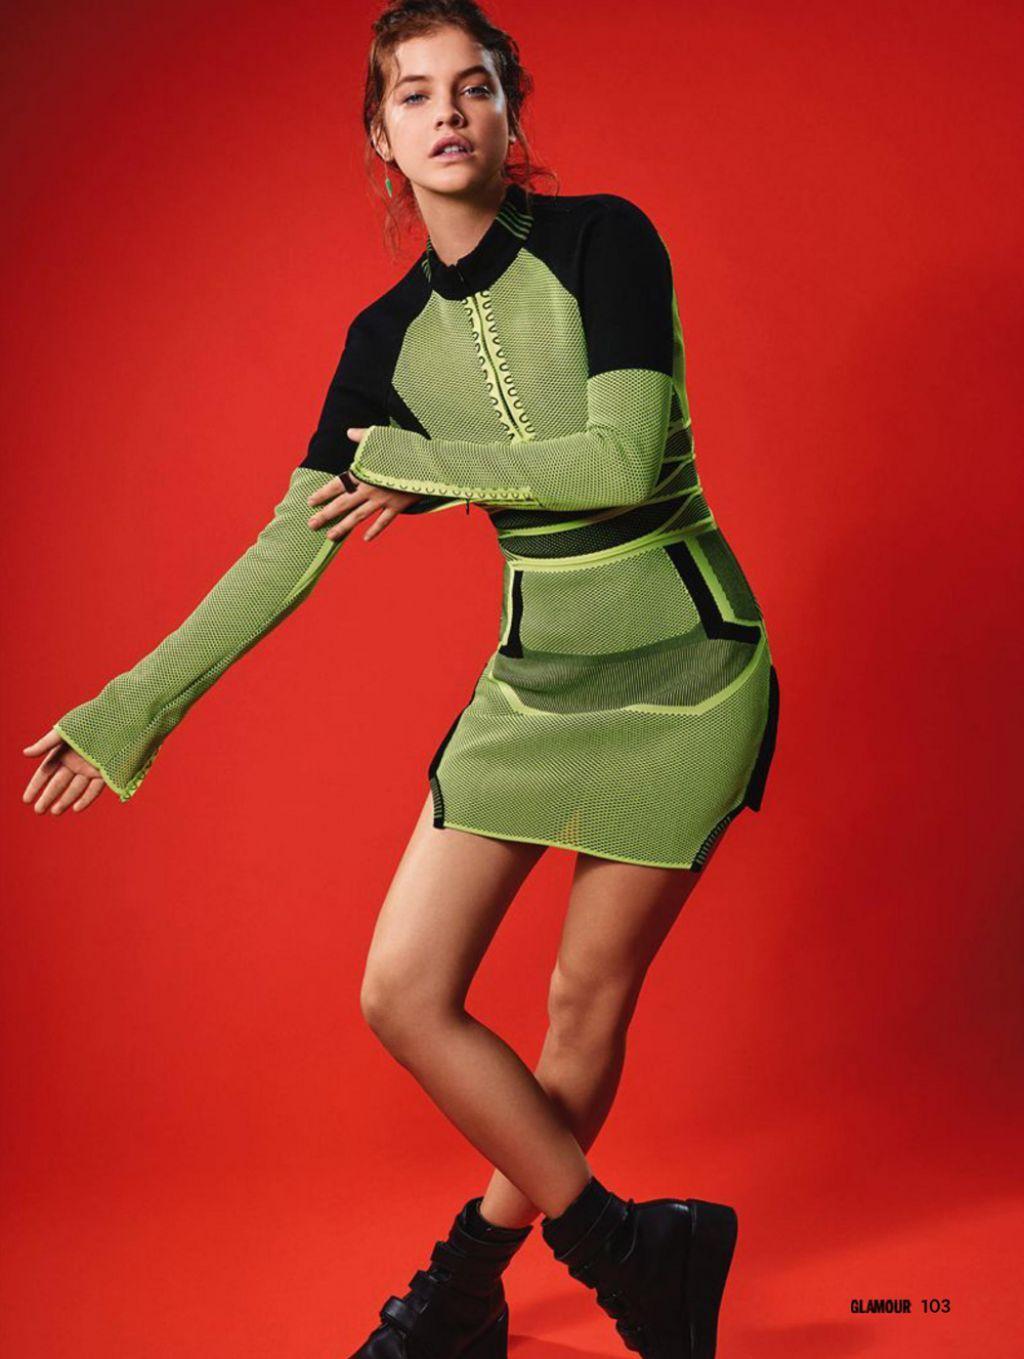 Barbara Palvin looks stunning in green. Barbara Palvin